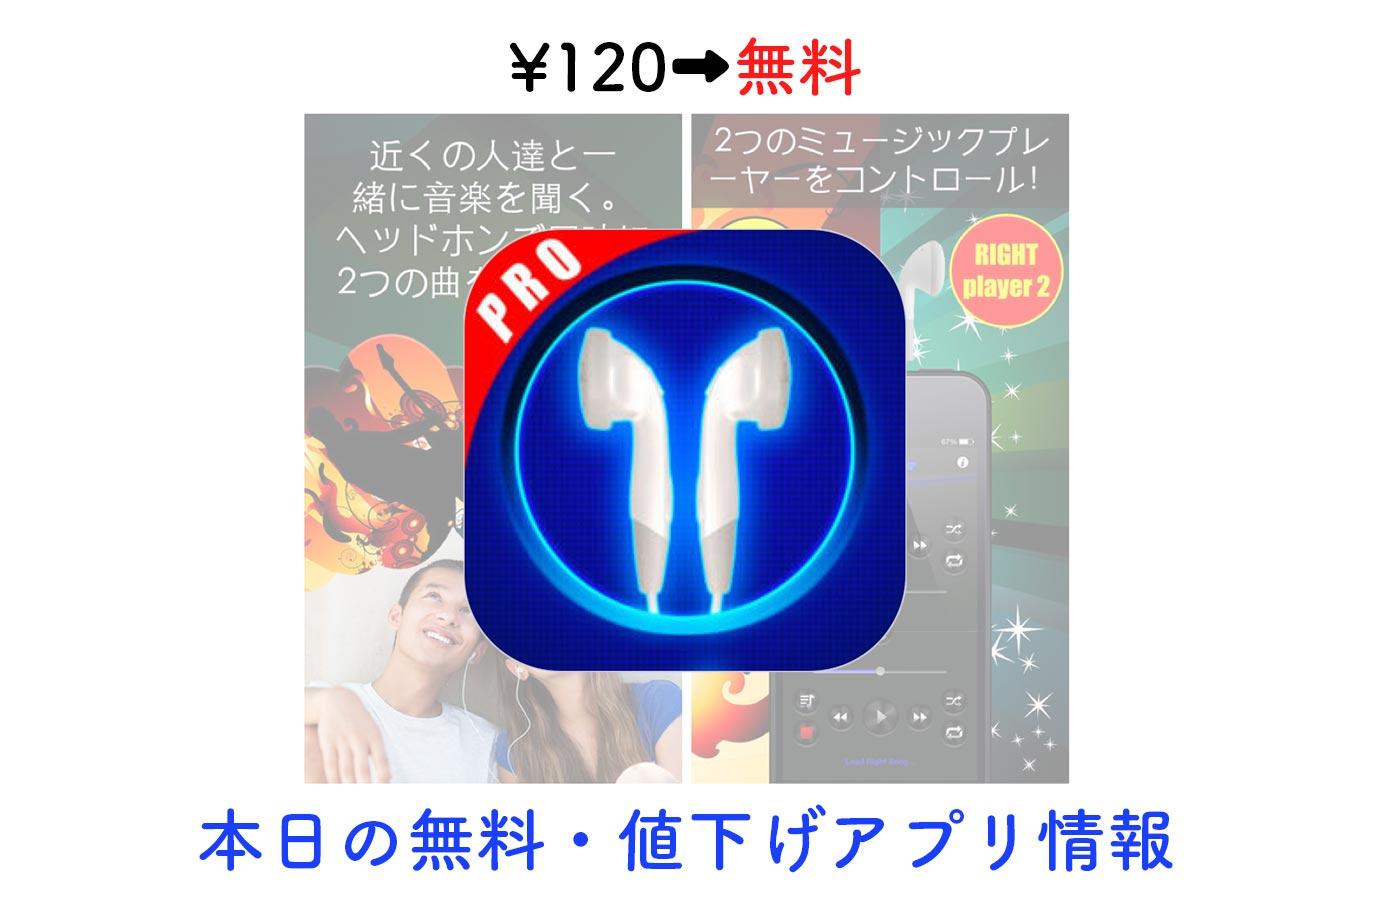 Appsale1227